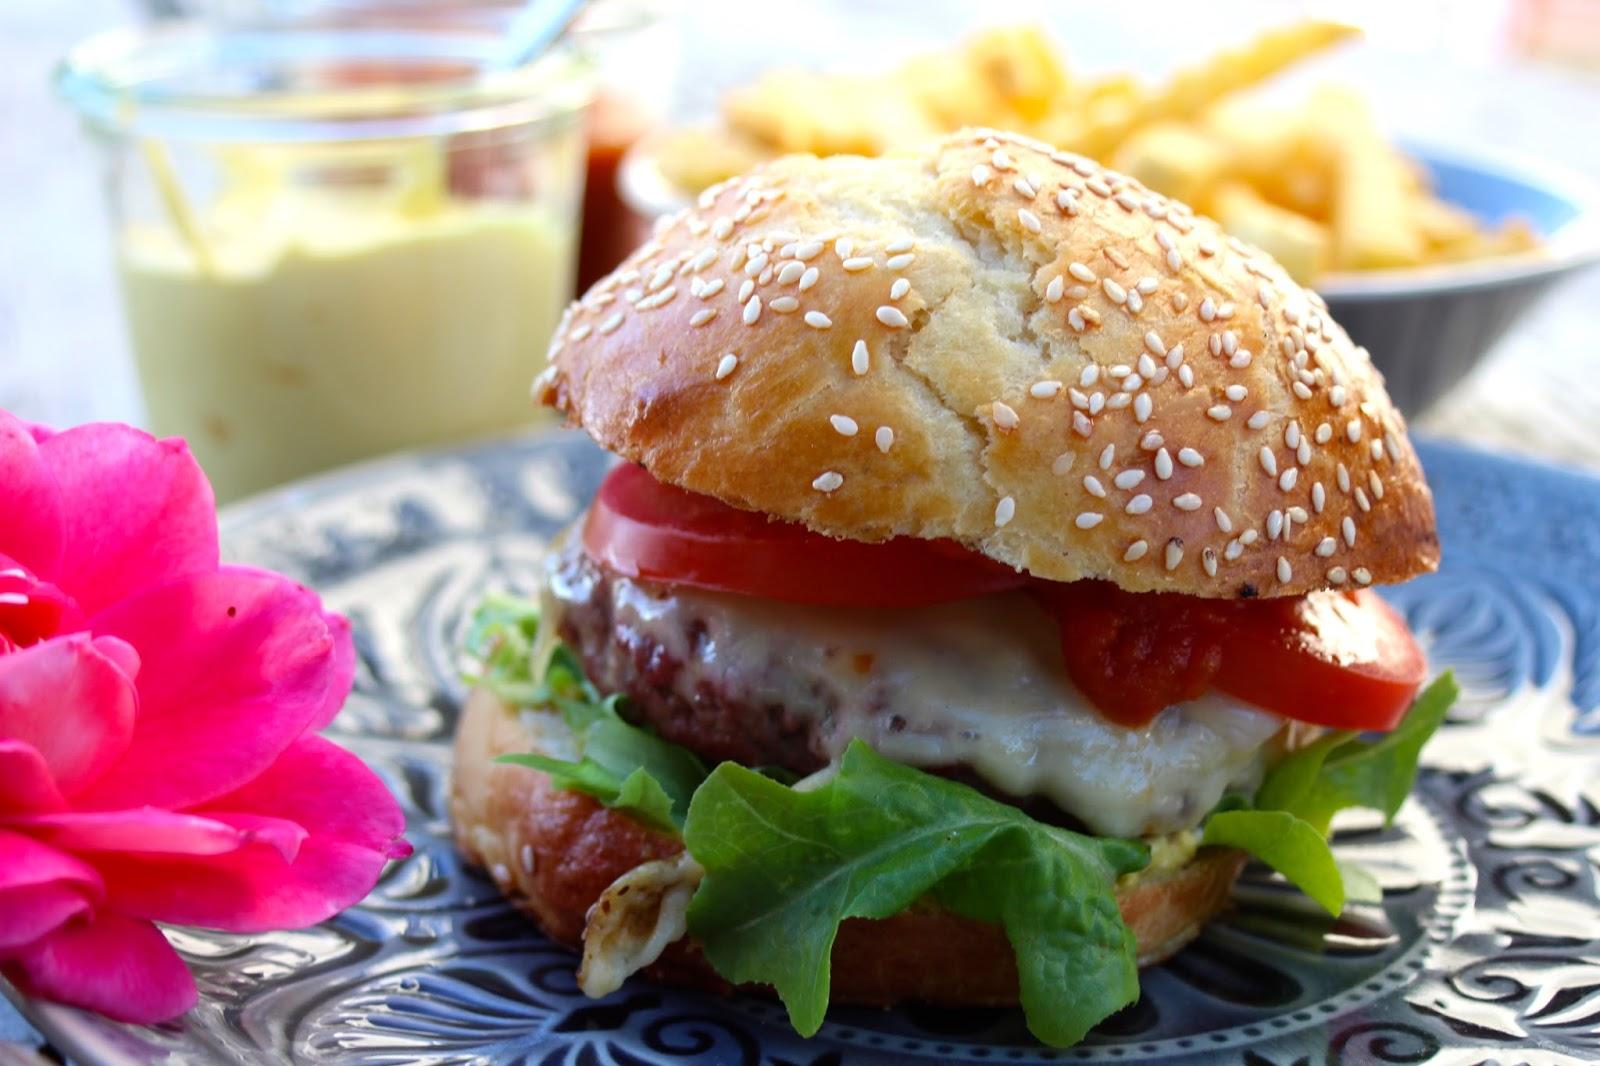 paulas frauchen perfekter cheeseburger mit selbstgemachter mayo ketchup. Black Bedroom Furniture Sets. Home Design Ideas